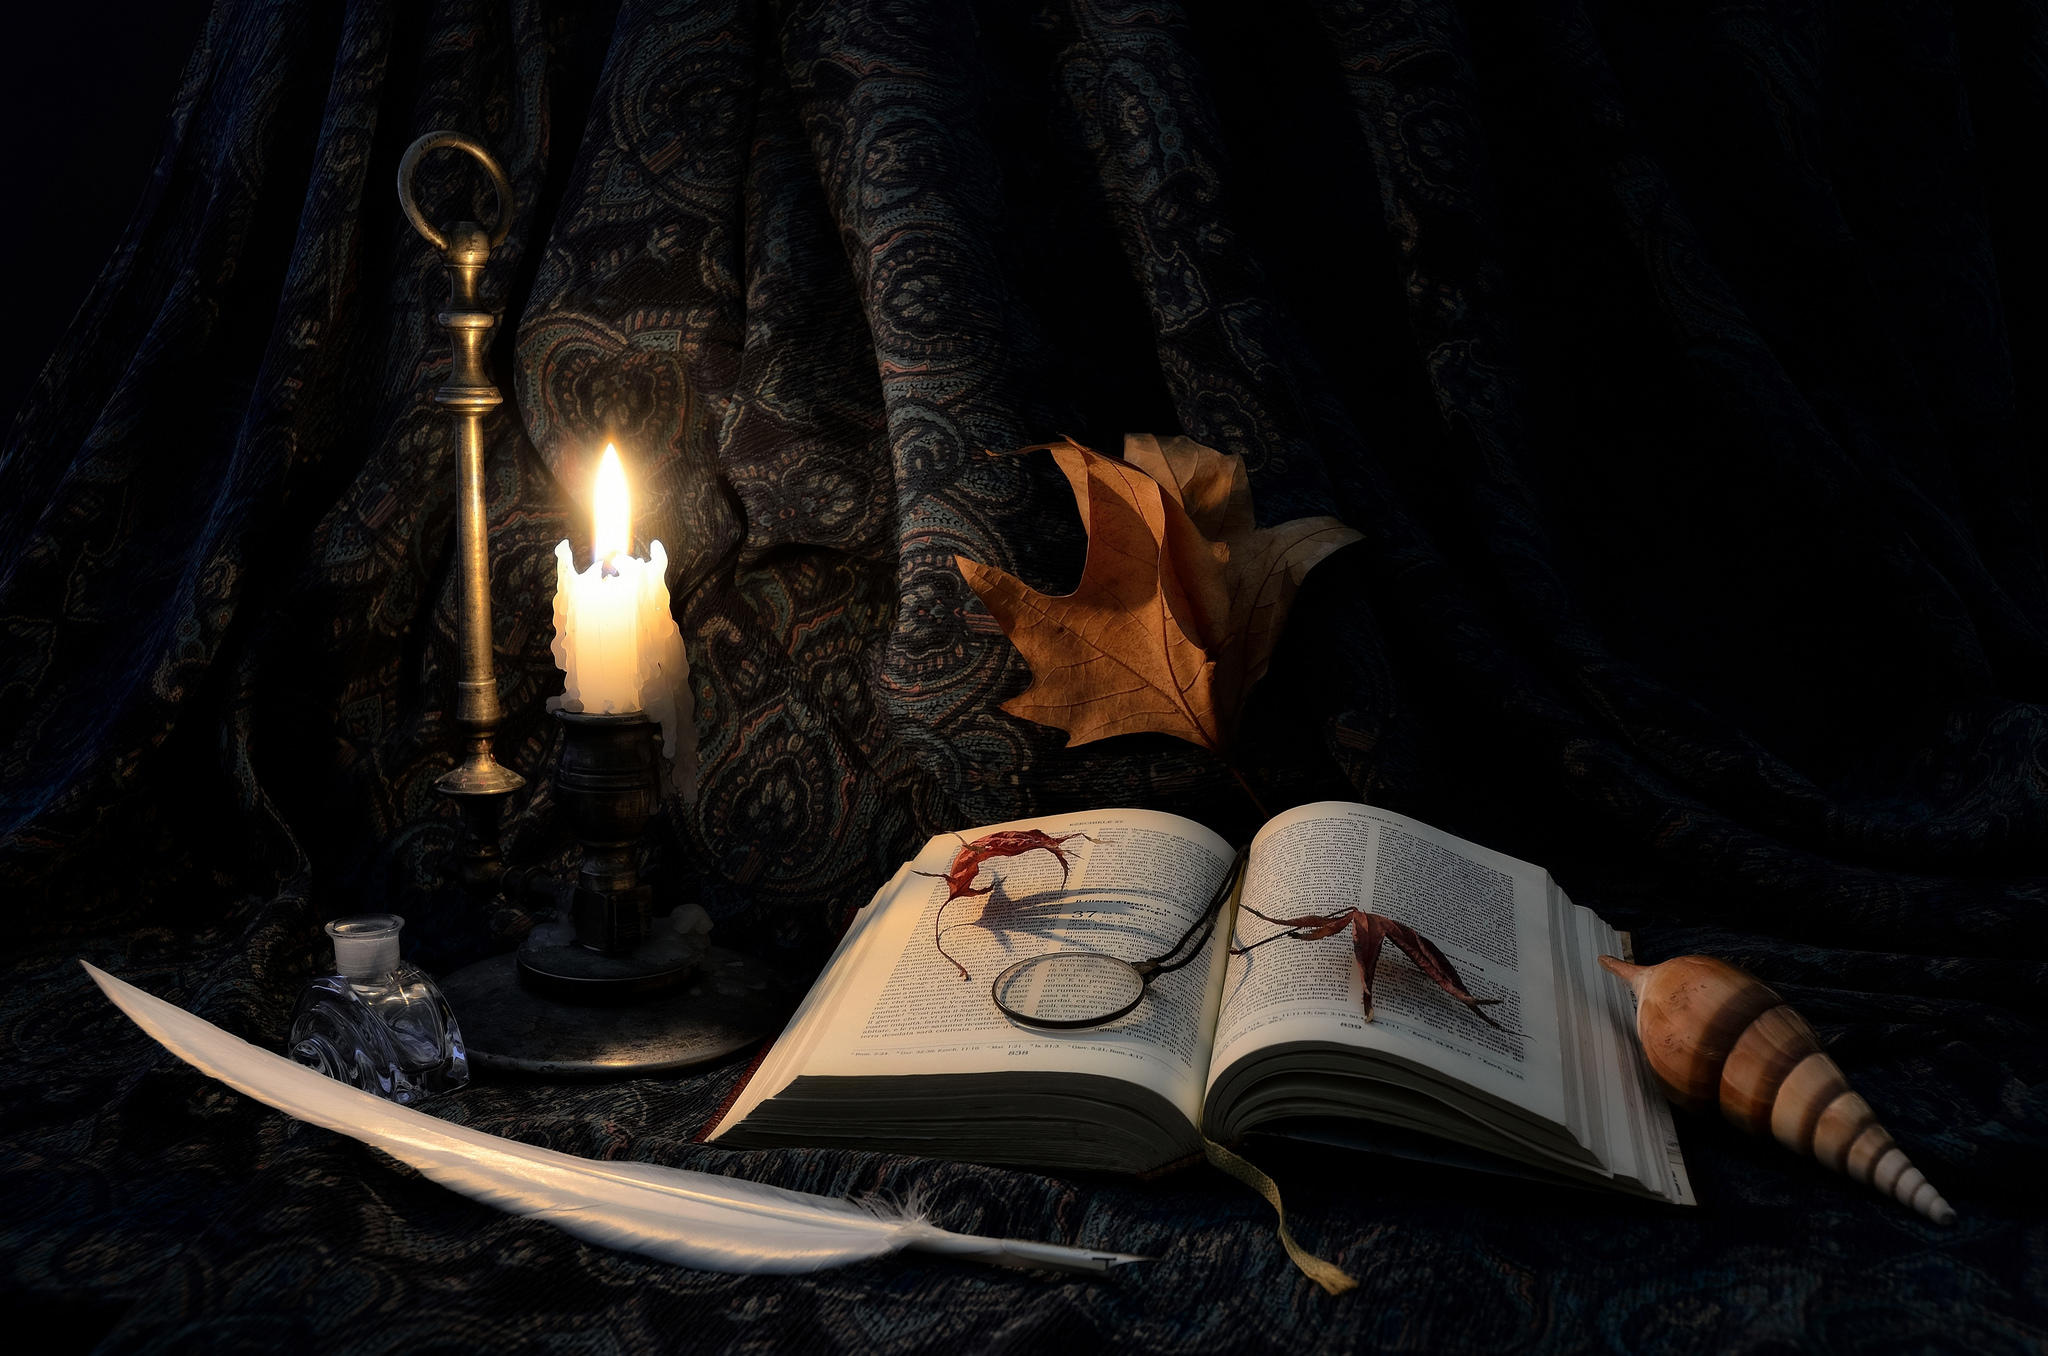 обои книга, перо, свеча, натюрморт картинки фото